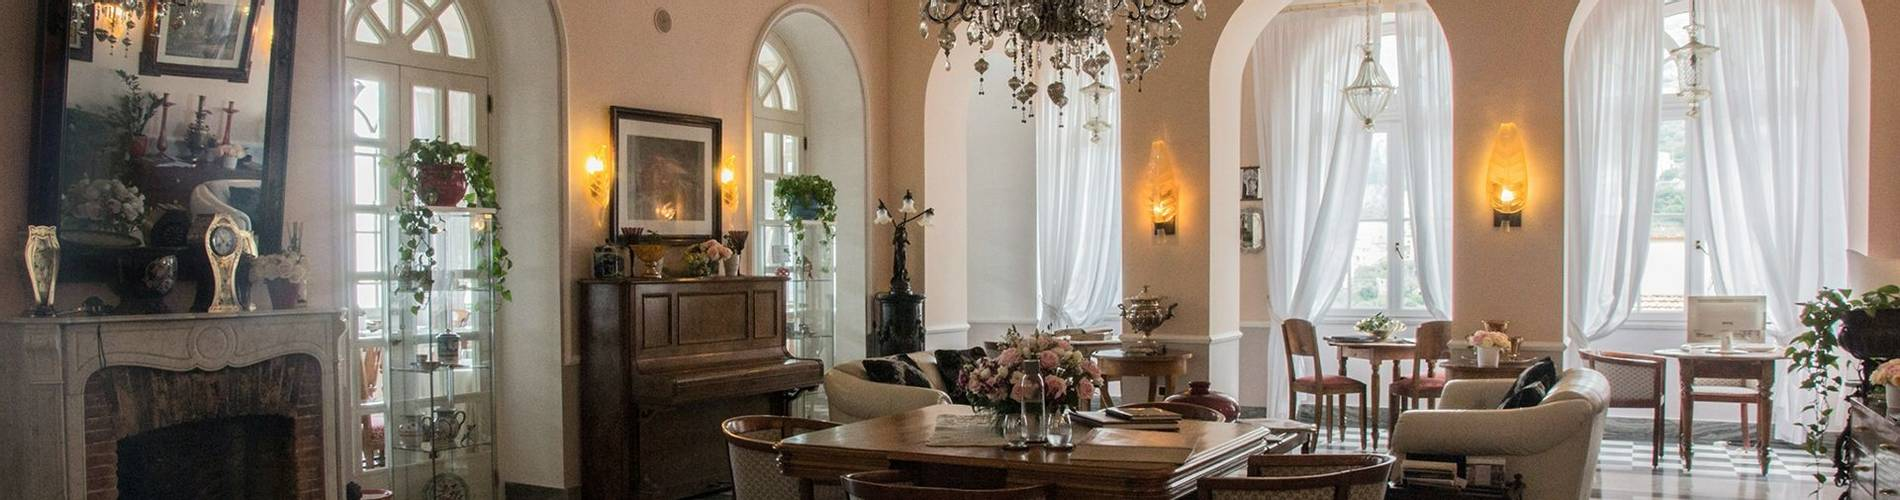 Villa Maria, Amalfi Coast, Italy, Lounge.jpg